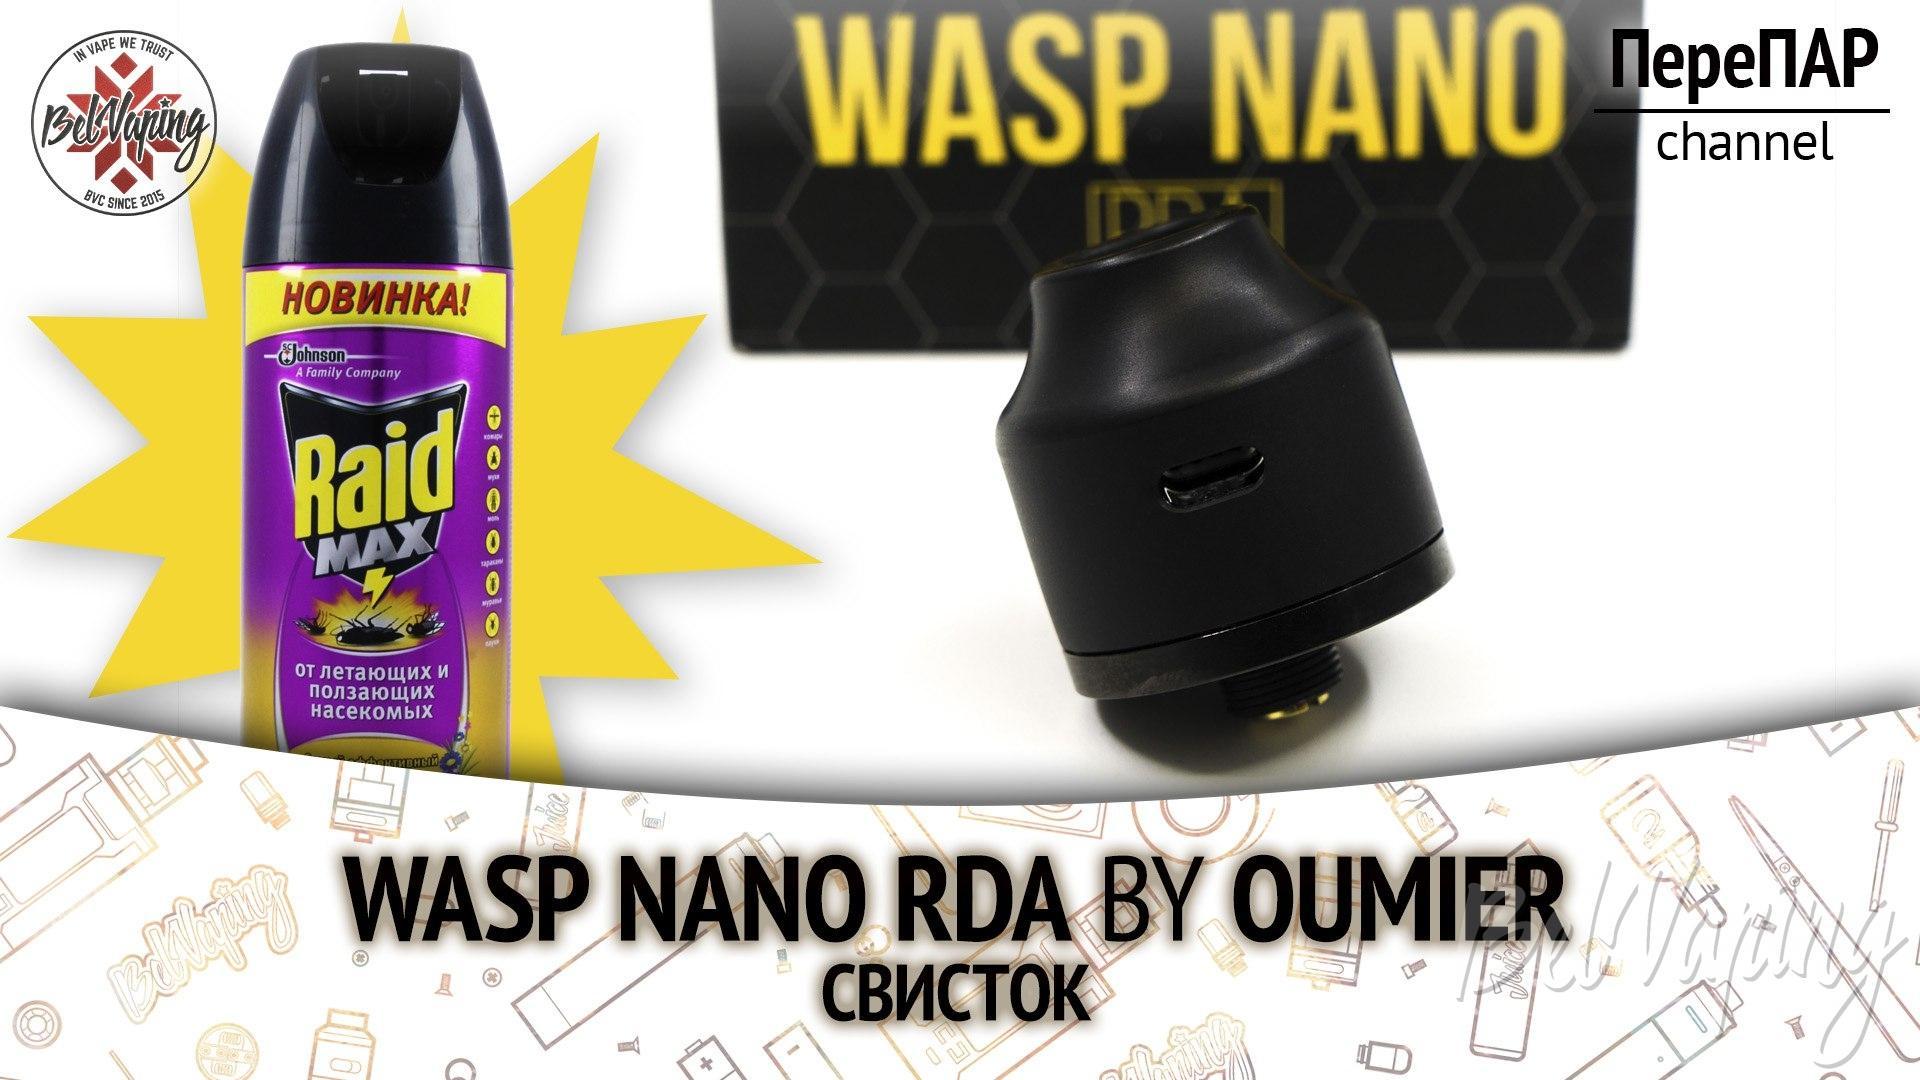 Обзор Wasp Nano RDA от Oumier